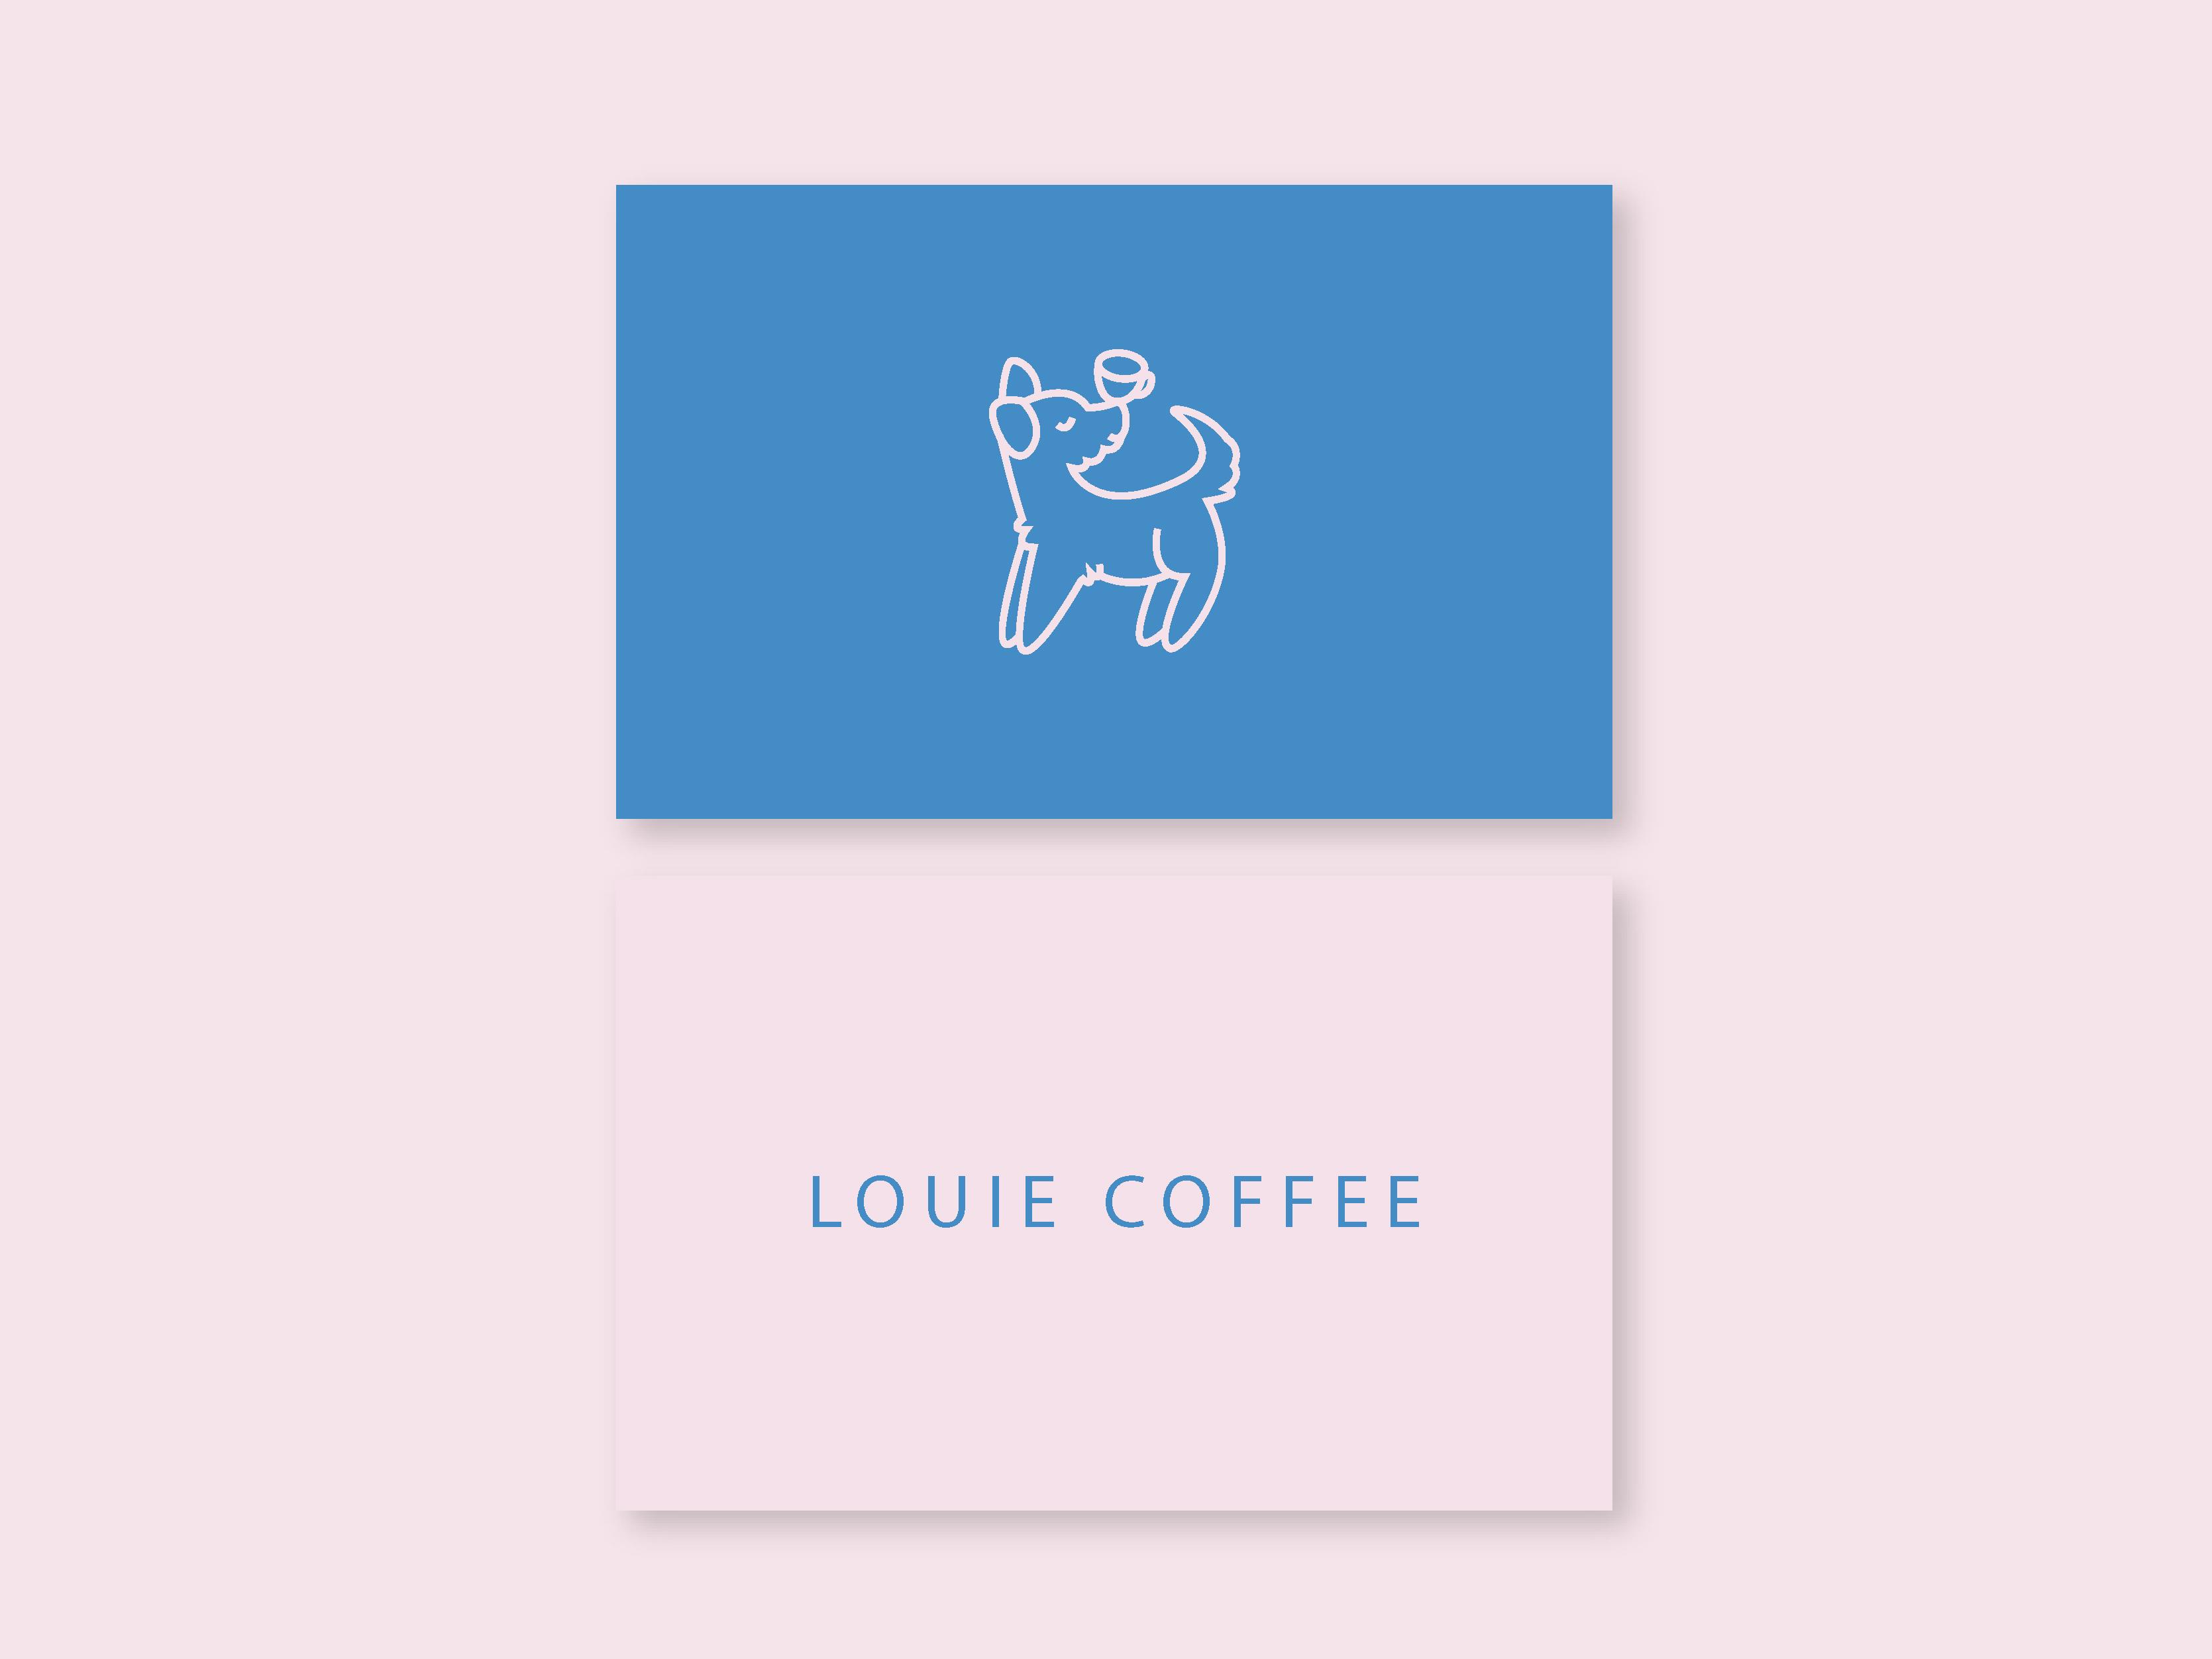 Louie 06